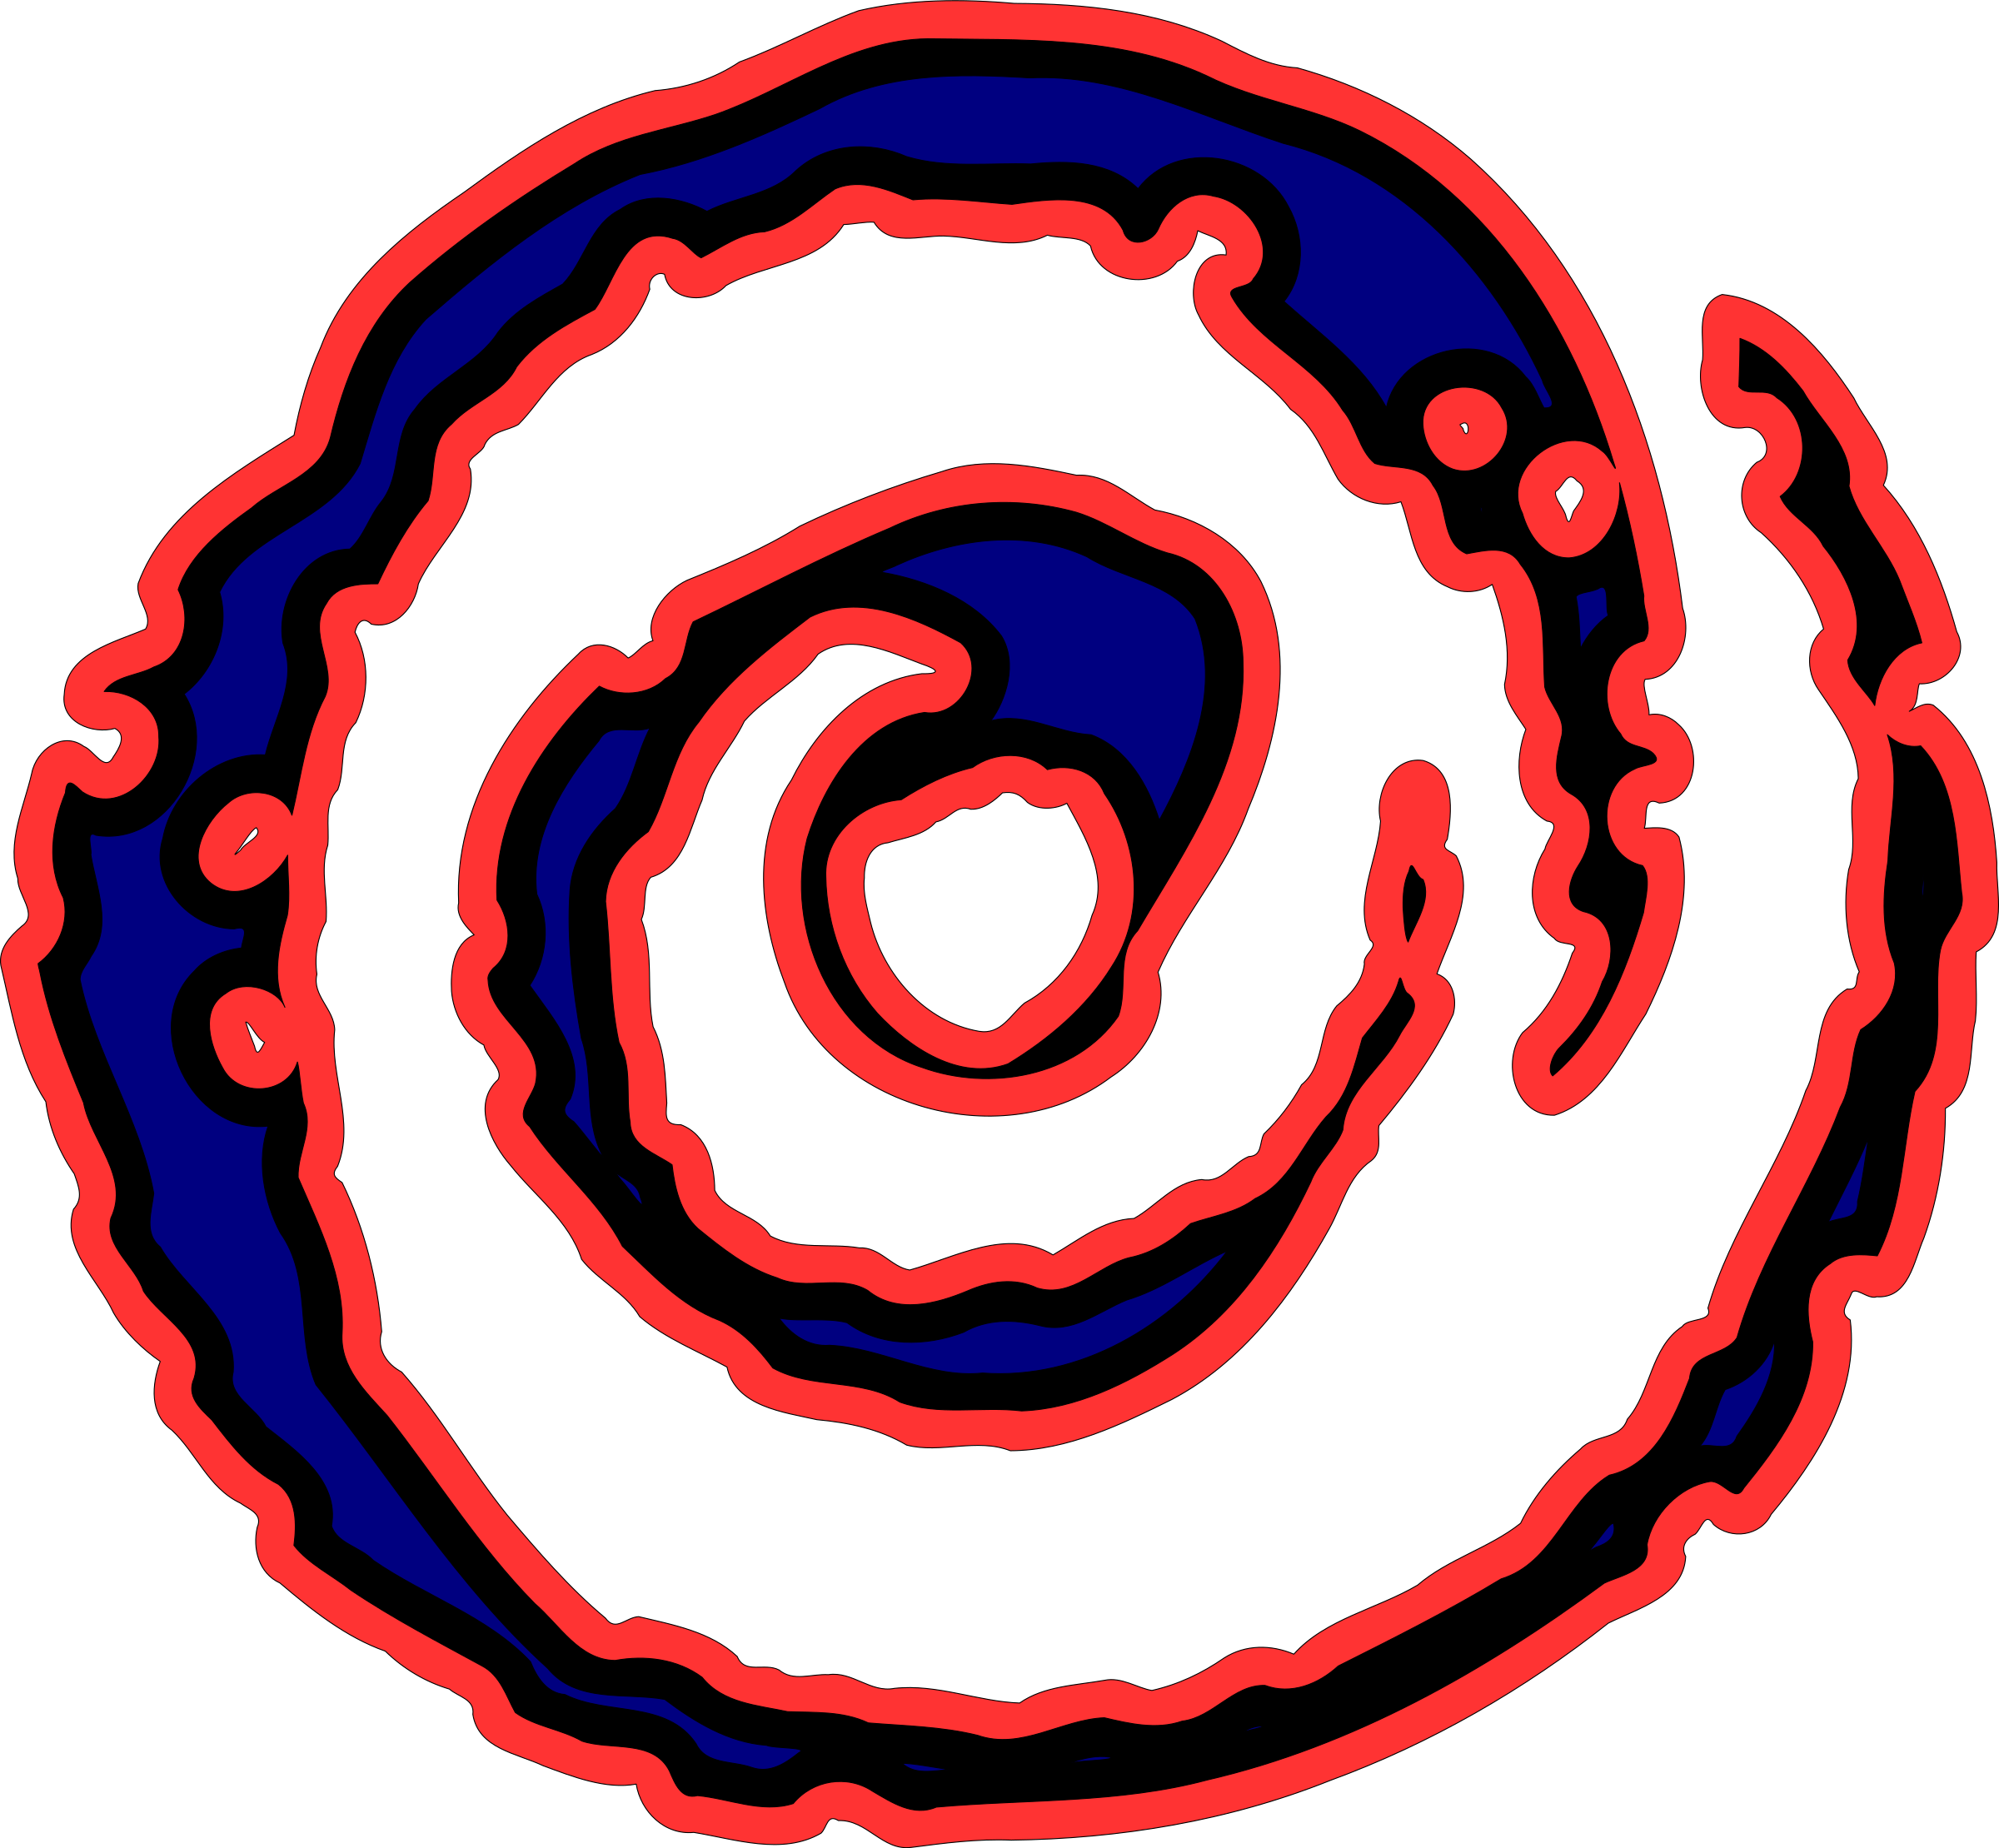 Sprial frames illustrations hd. Galaxy clipart form